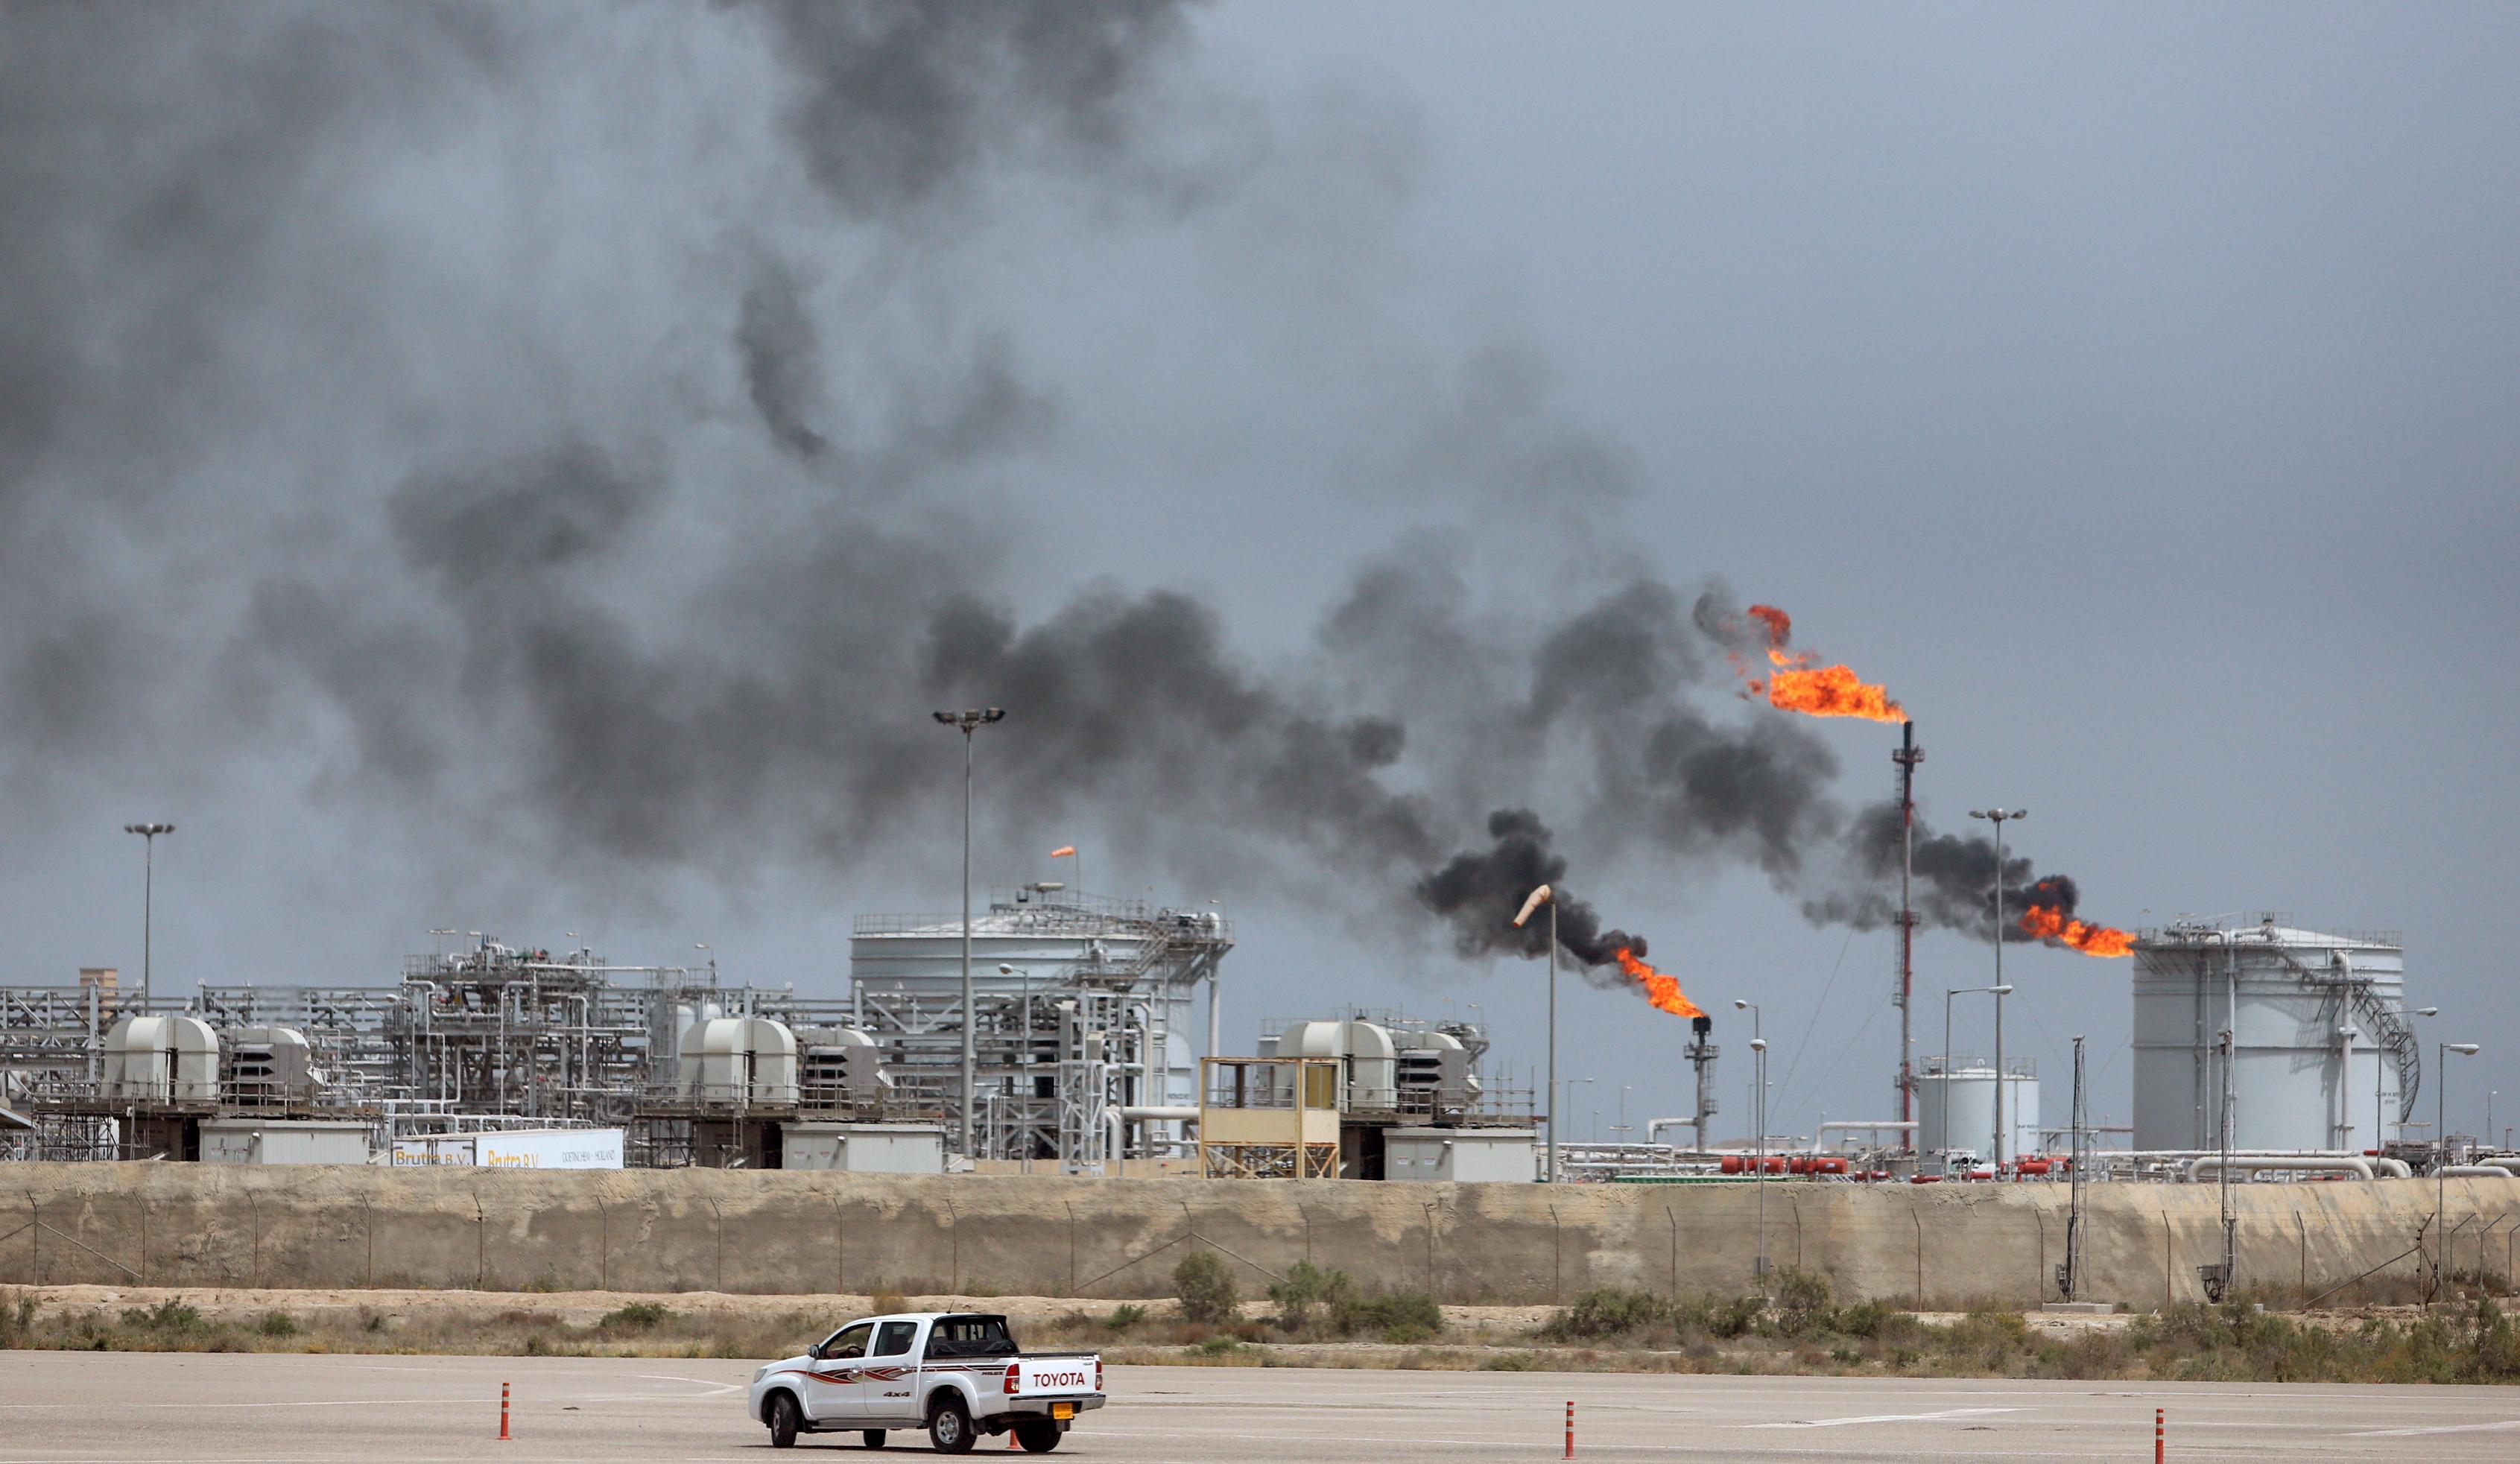 FIILE PHOTO: A view shows the Iraq's Majnoon oilfield near Basra, Iraq, March 31, 2021.  REUTERS/Essam Al-Sudani